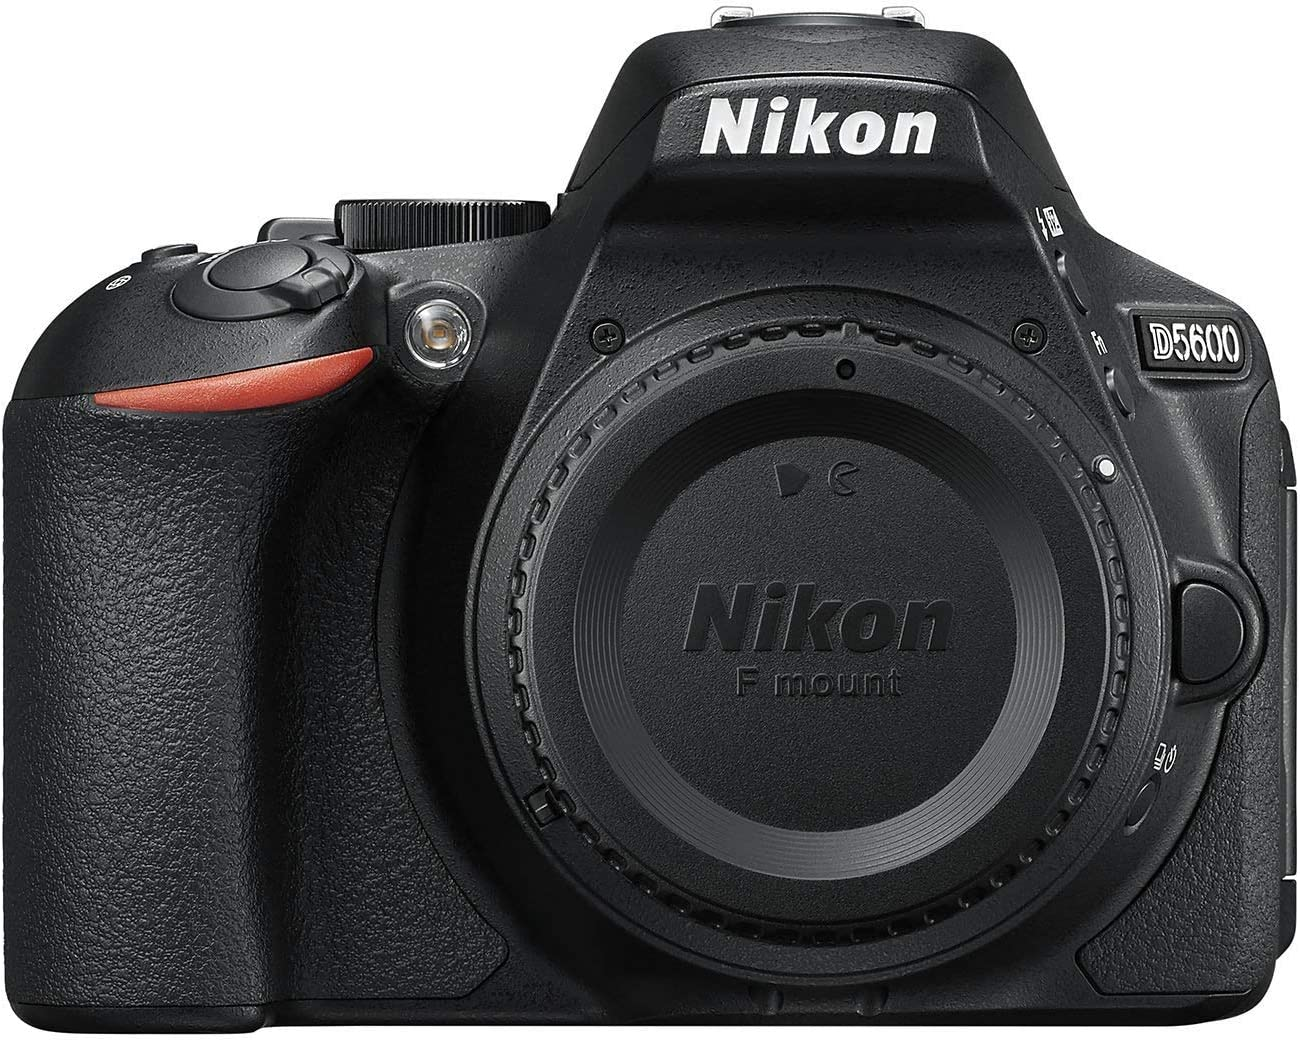 Nikon D5600 DX-Format Digital SLR Body (Renewed)